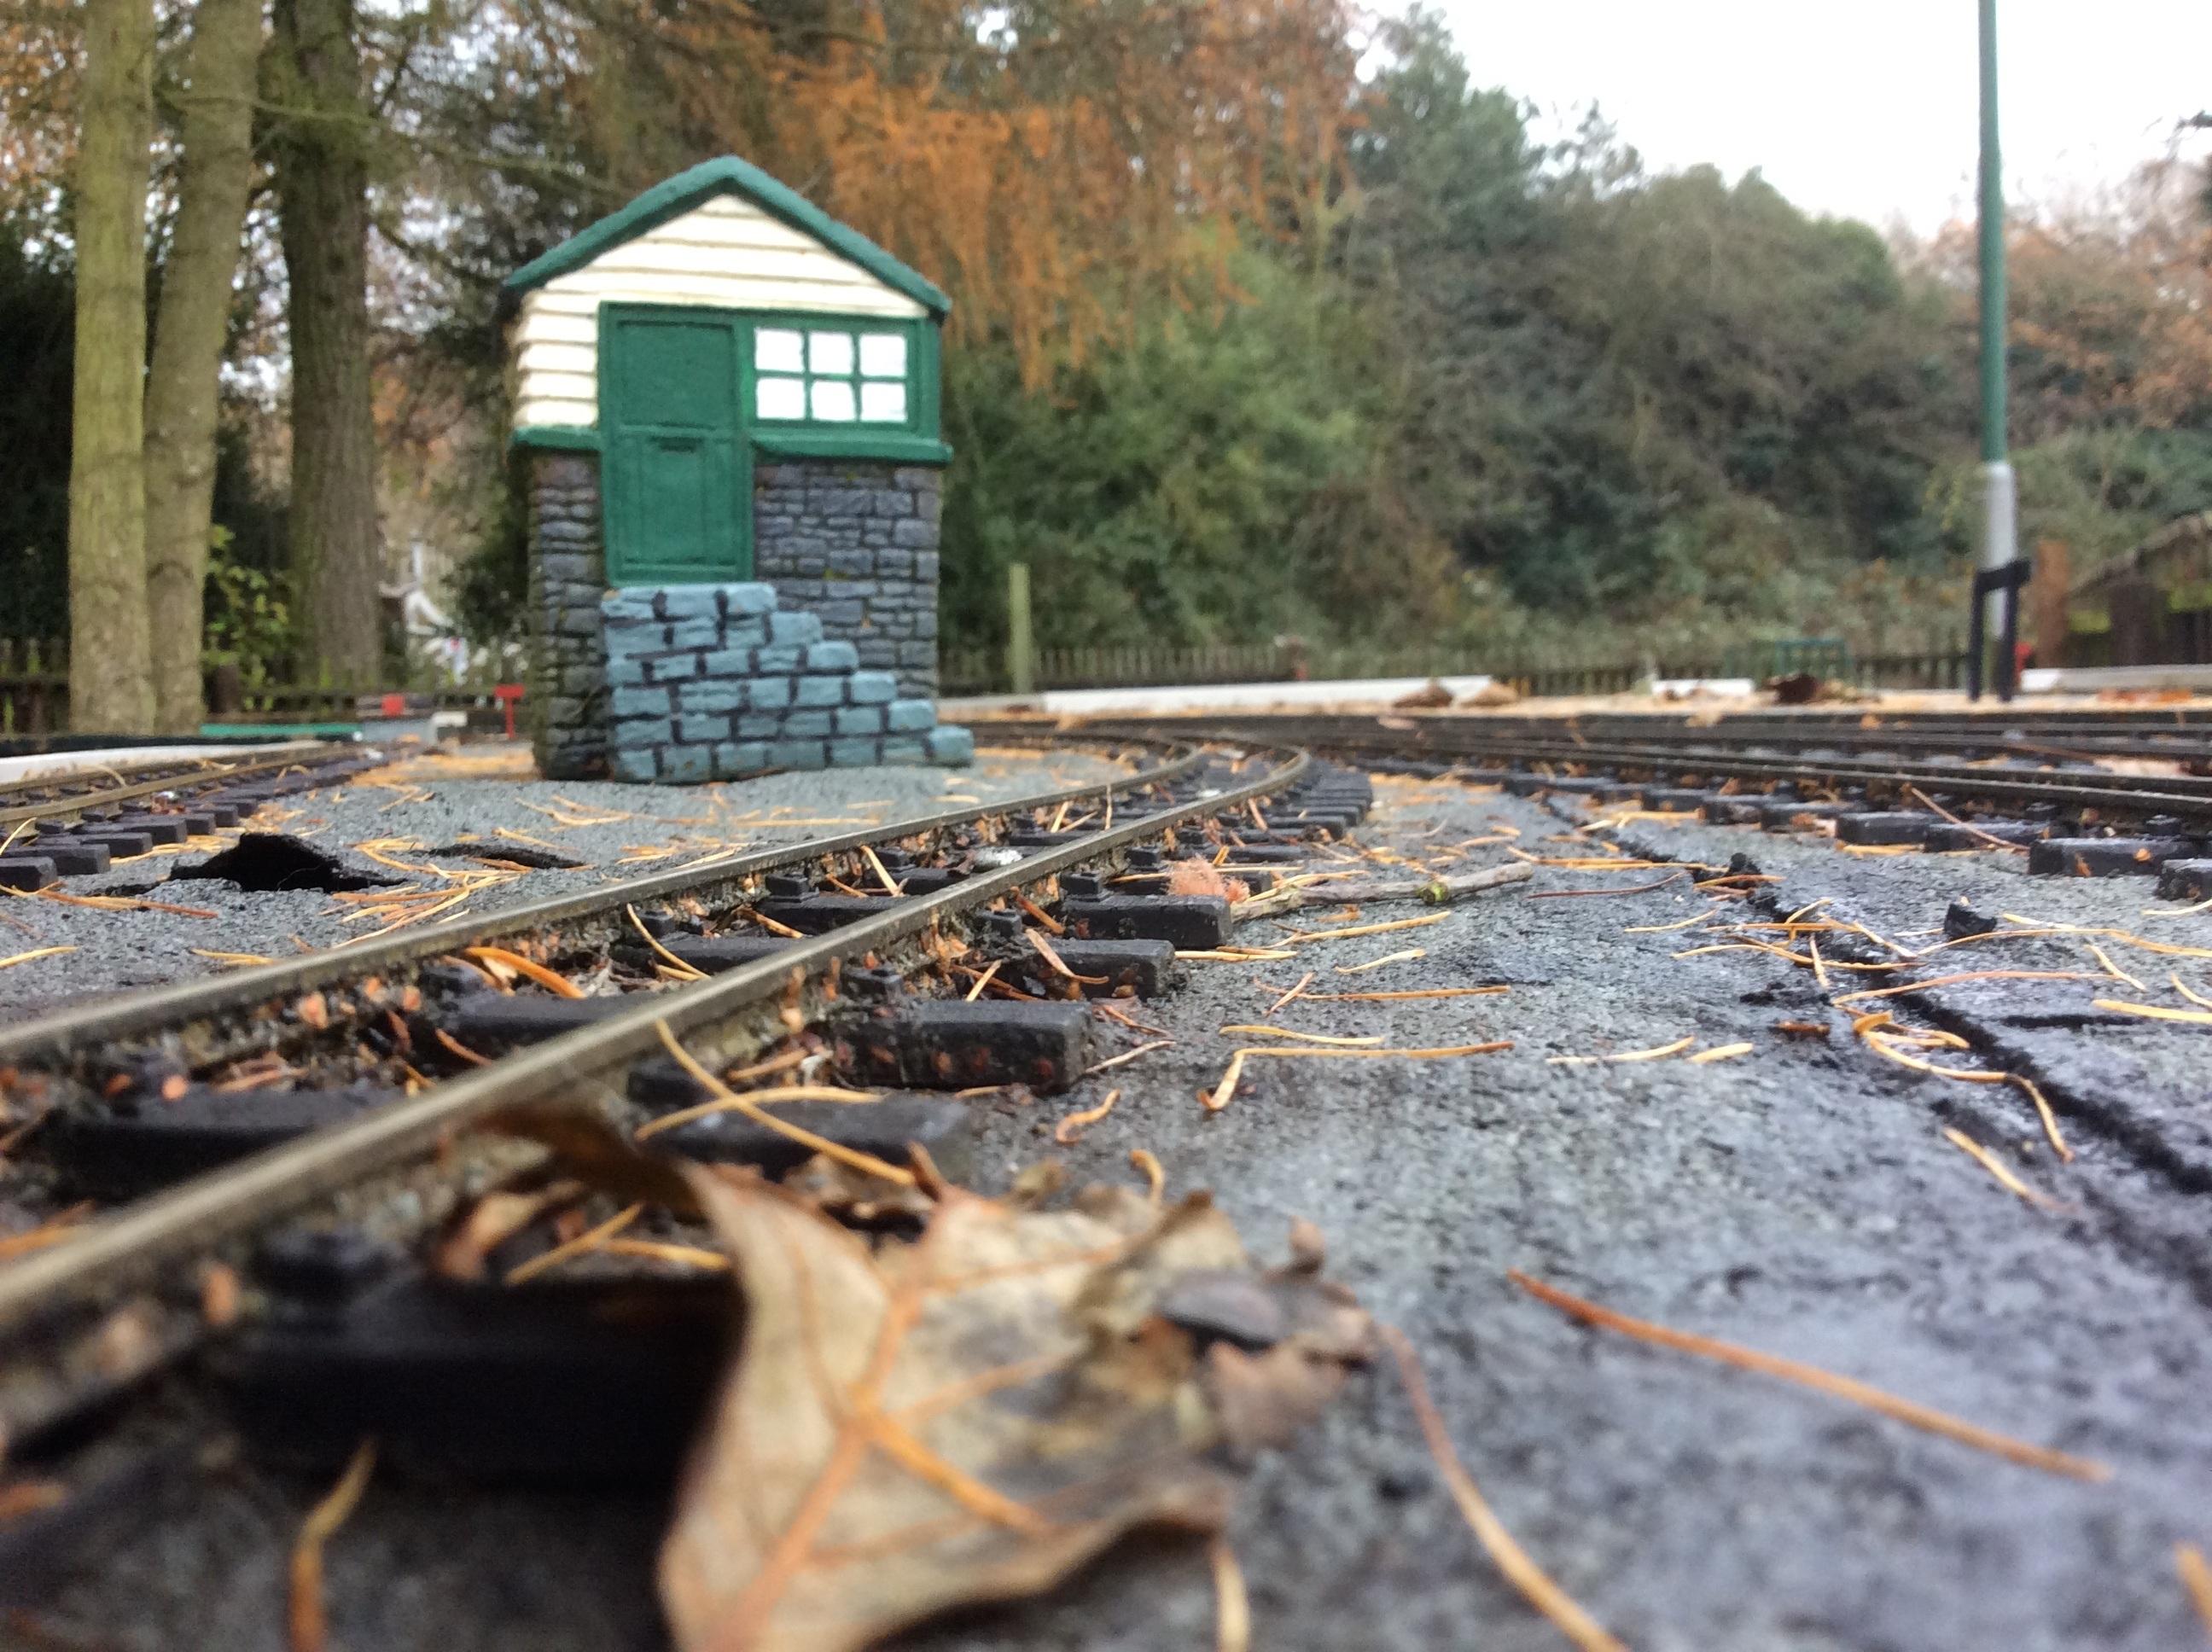 madera pista transporte suelo locomotora carro trenes railyard fenomeno geologico